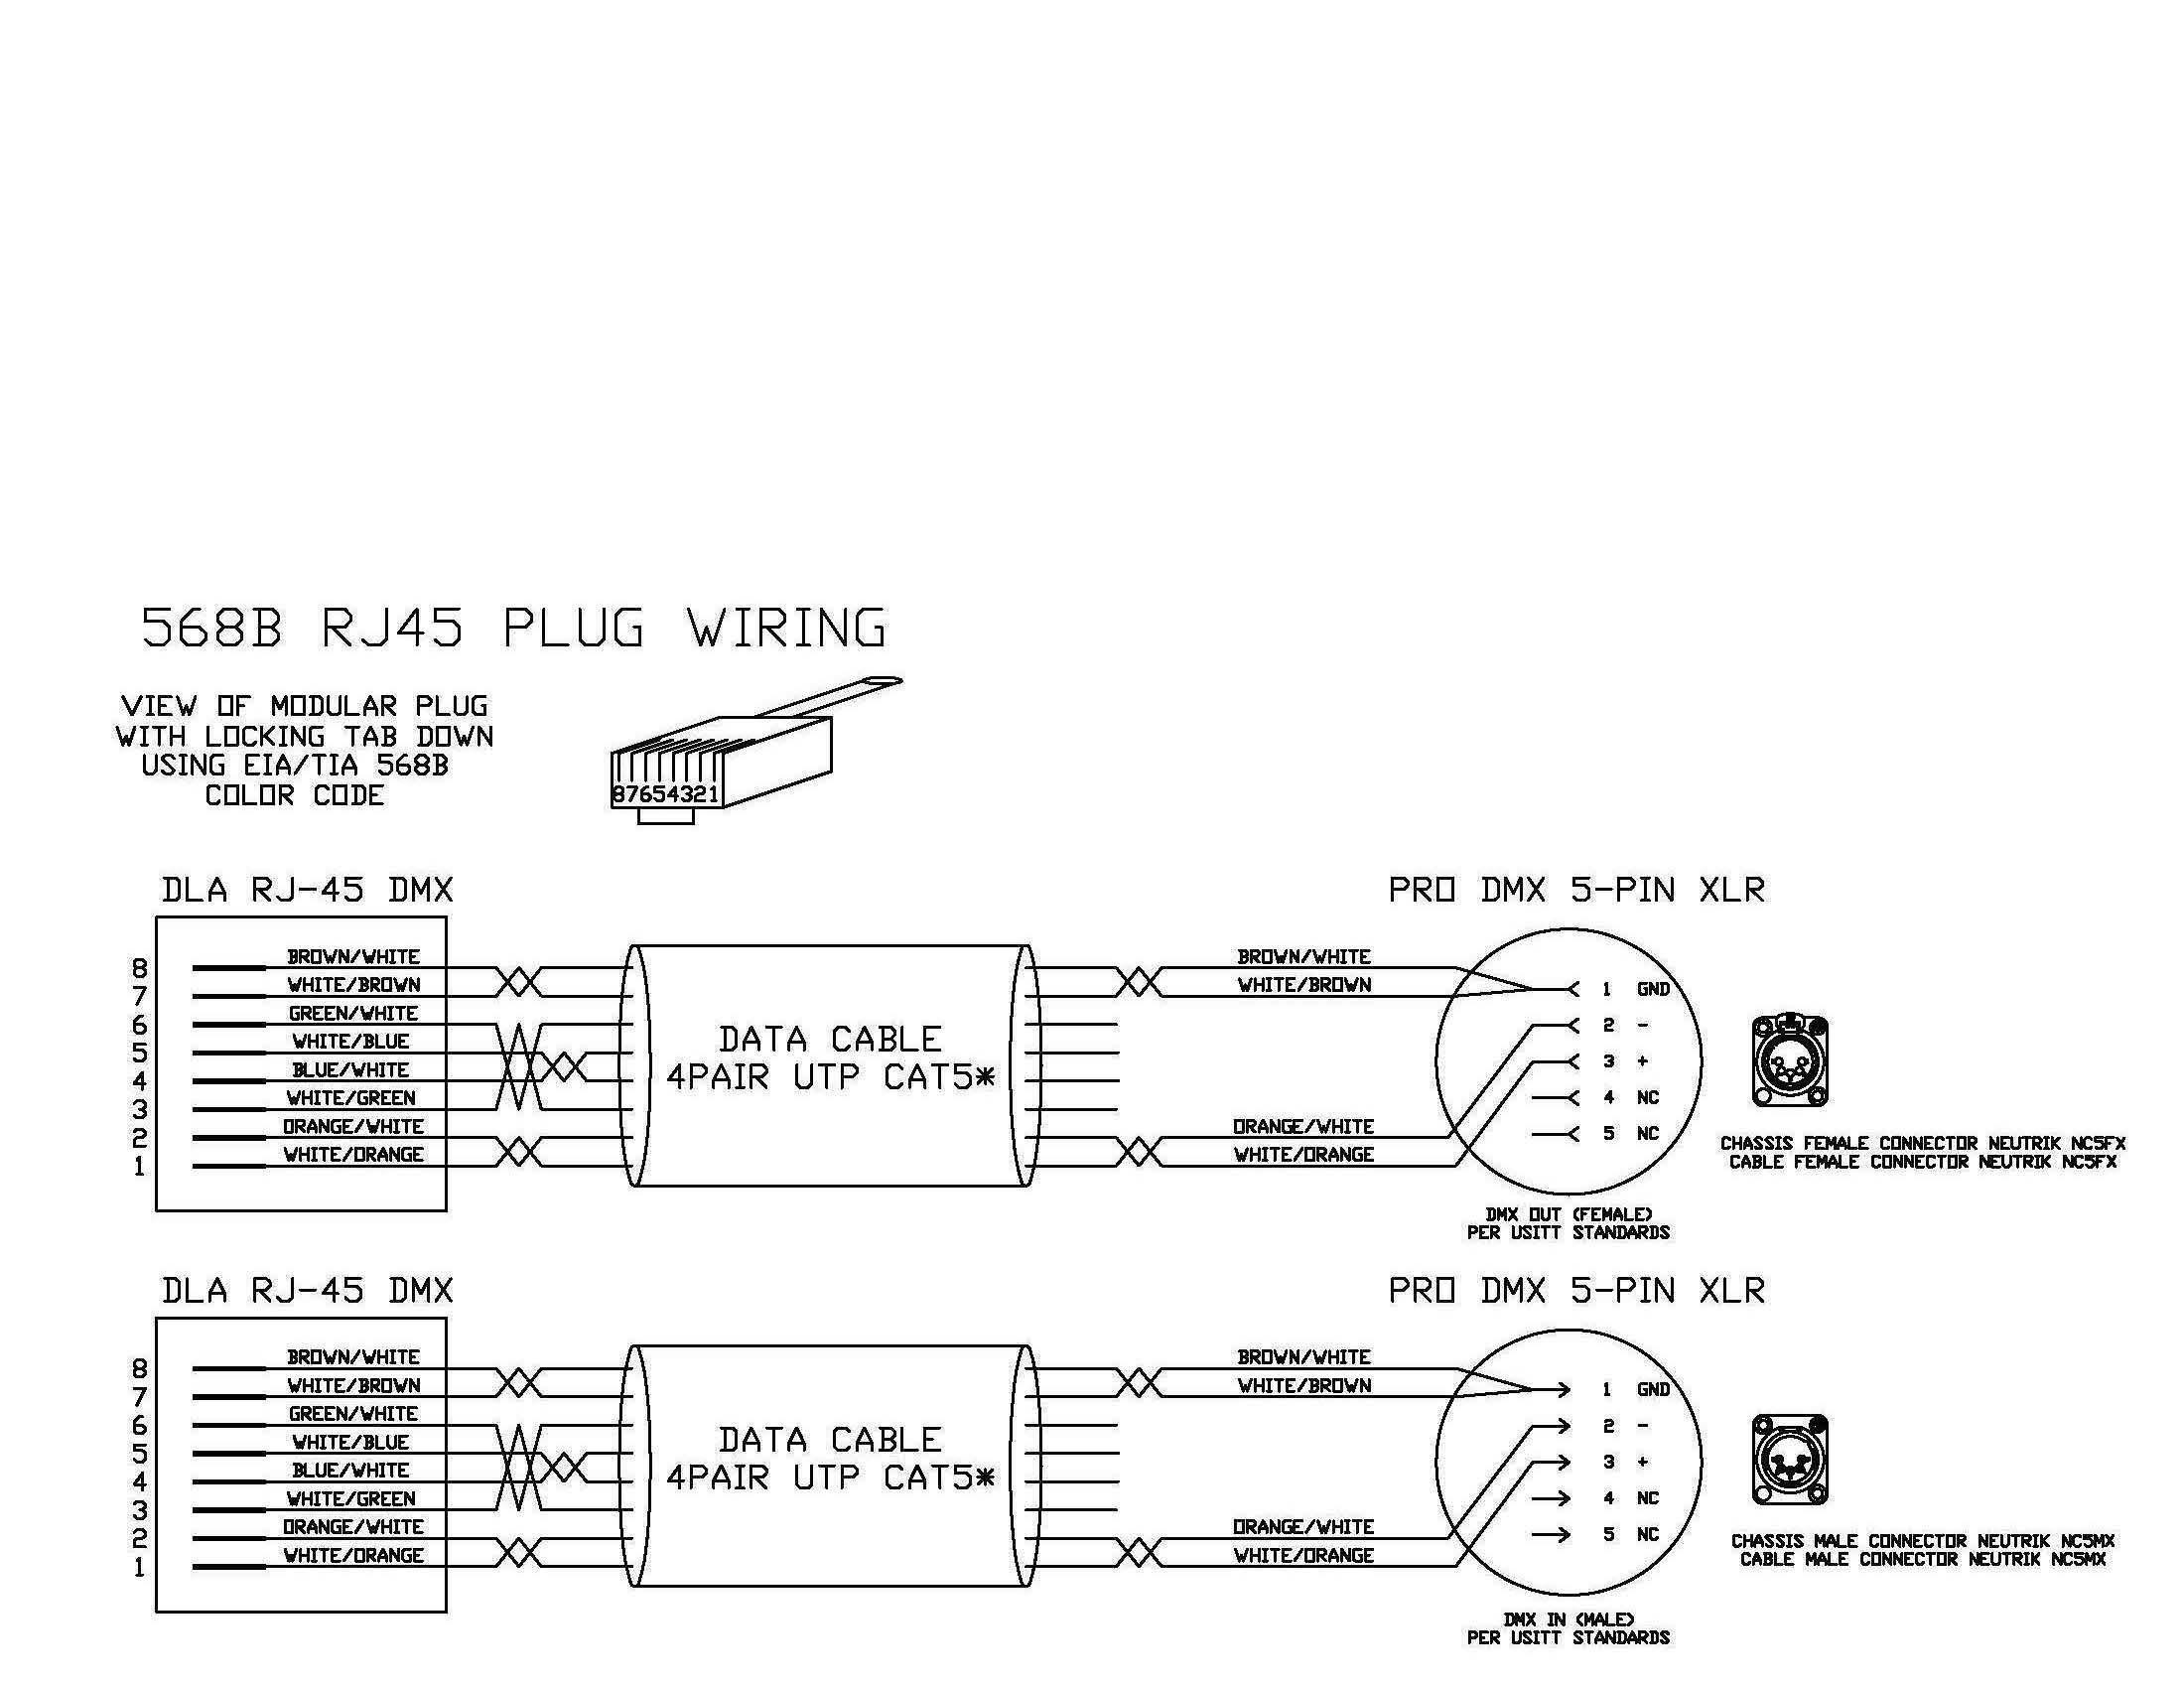 harley davidson wiring diagram darren criss best wiring libraryharley davidson wiring diagram darren criss